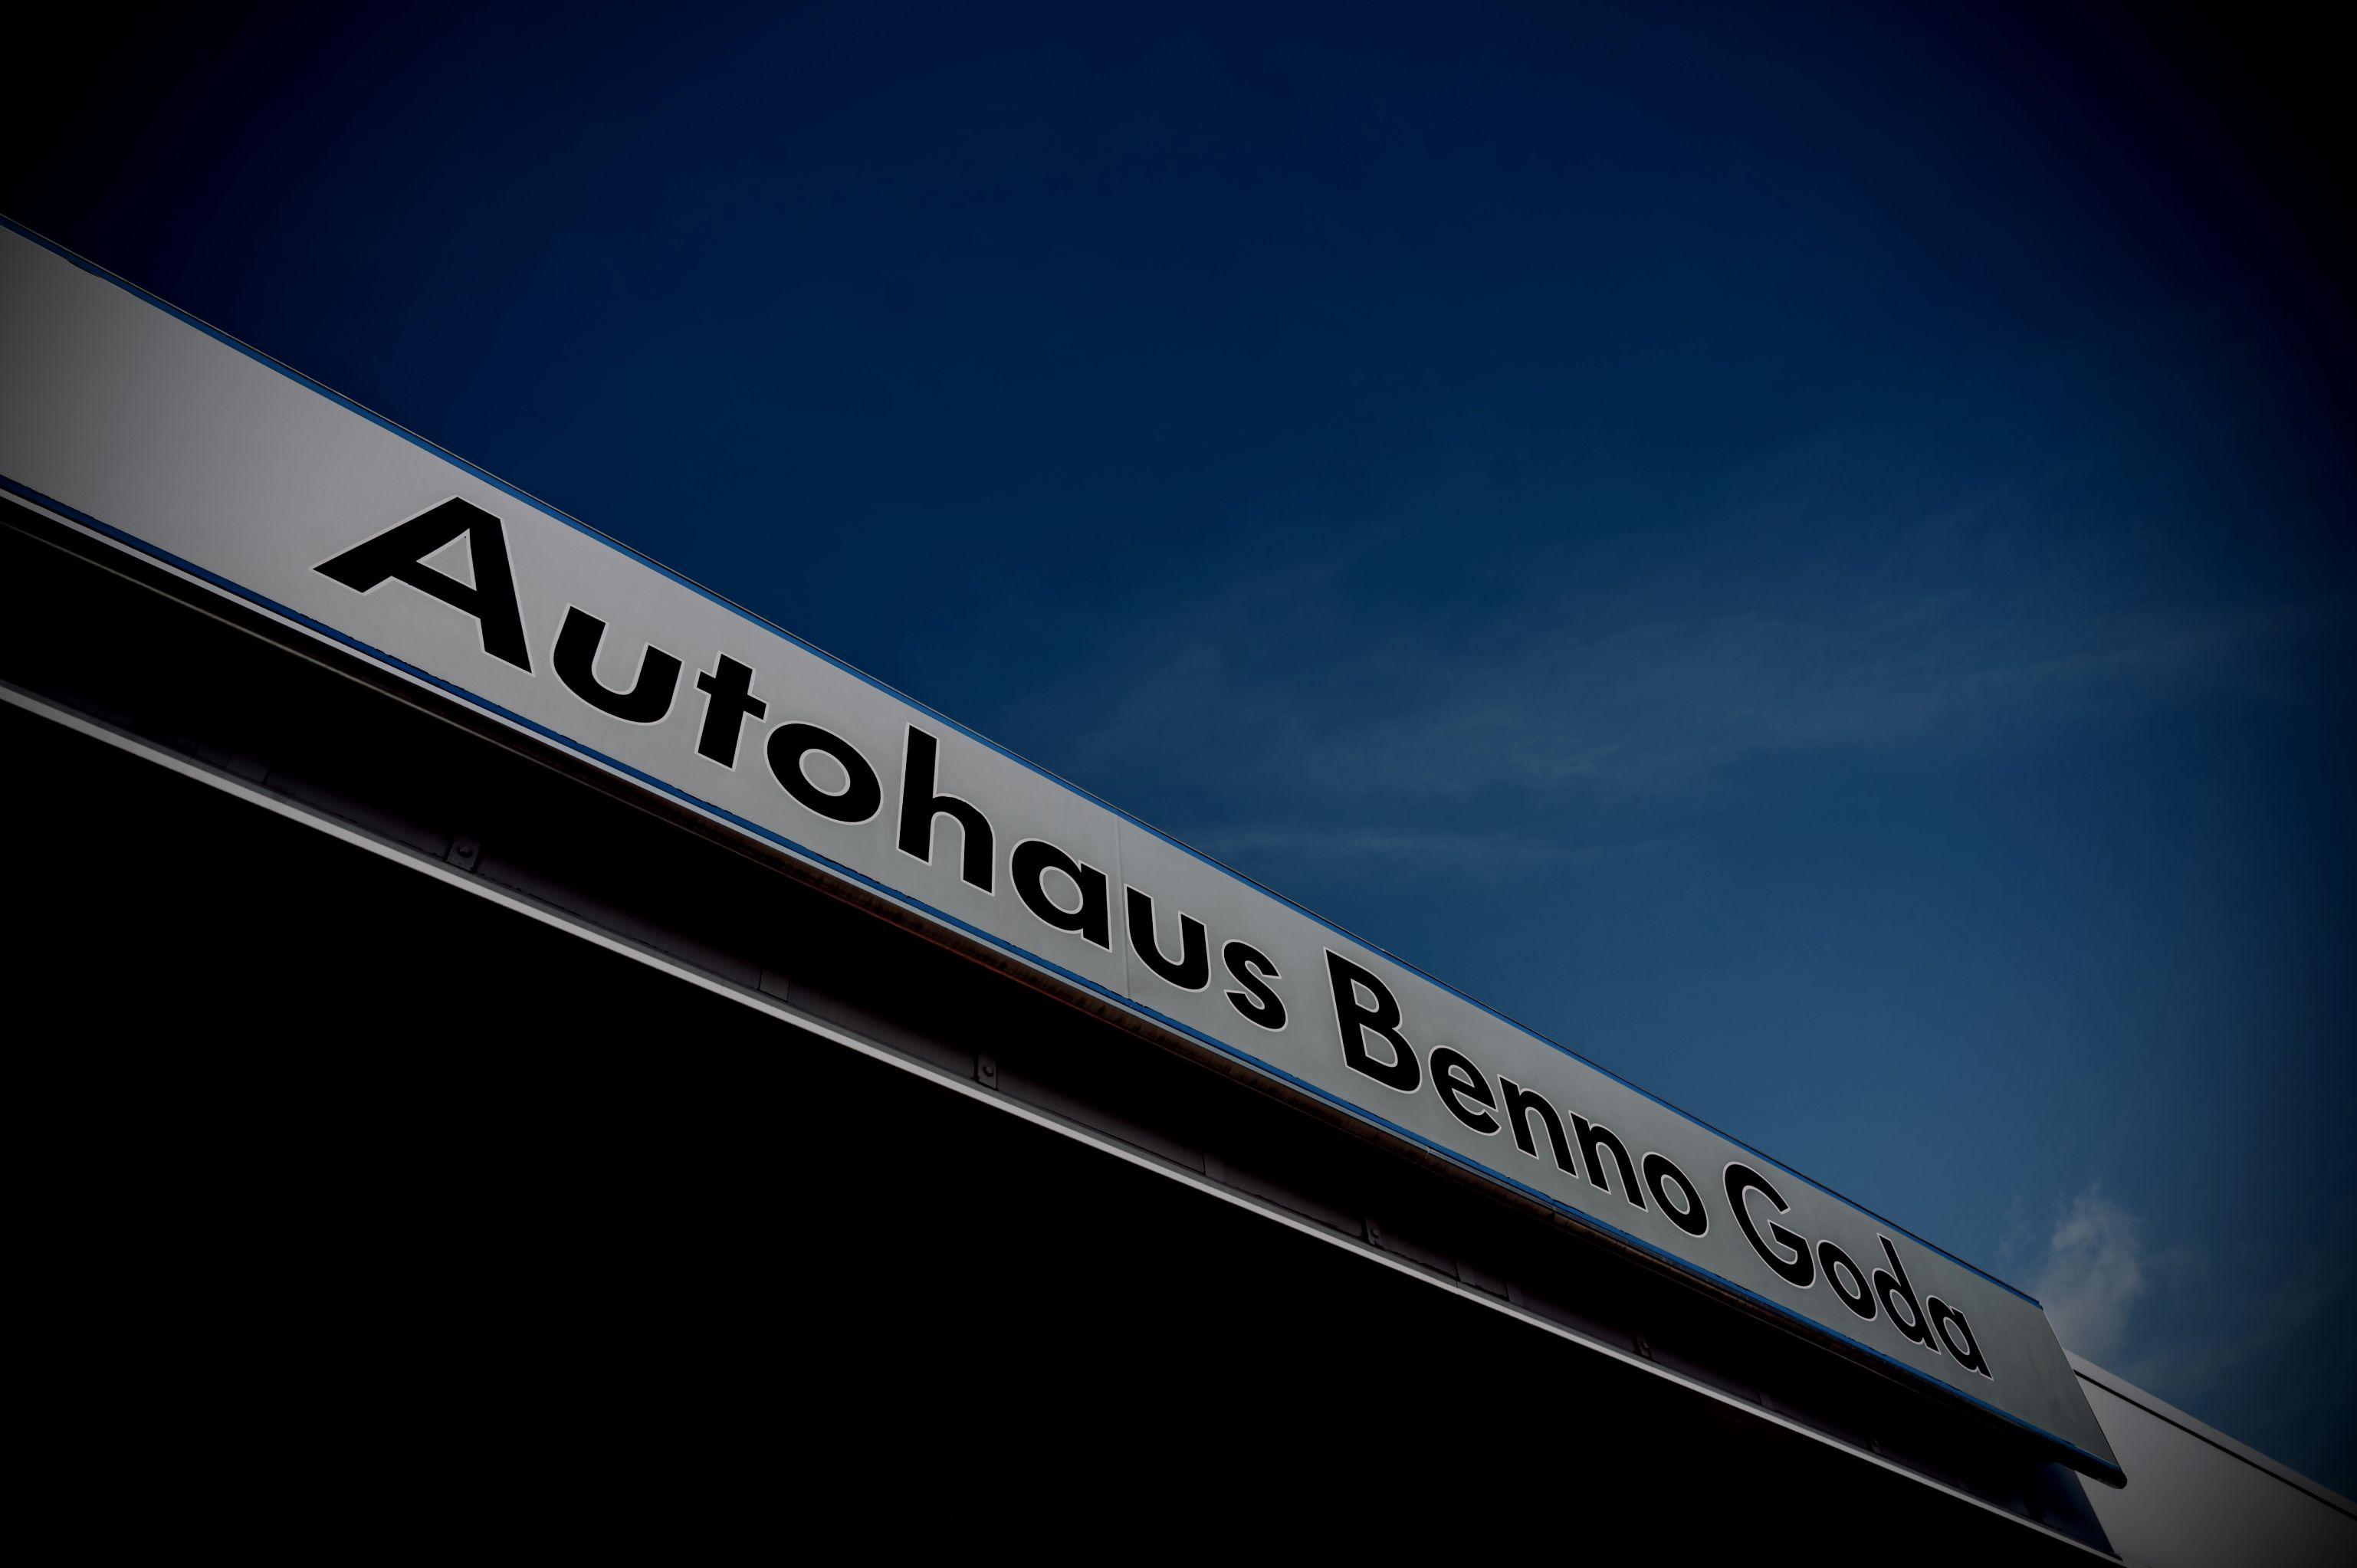 Autohaus Benno Goda